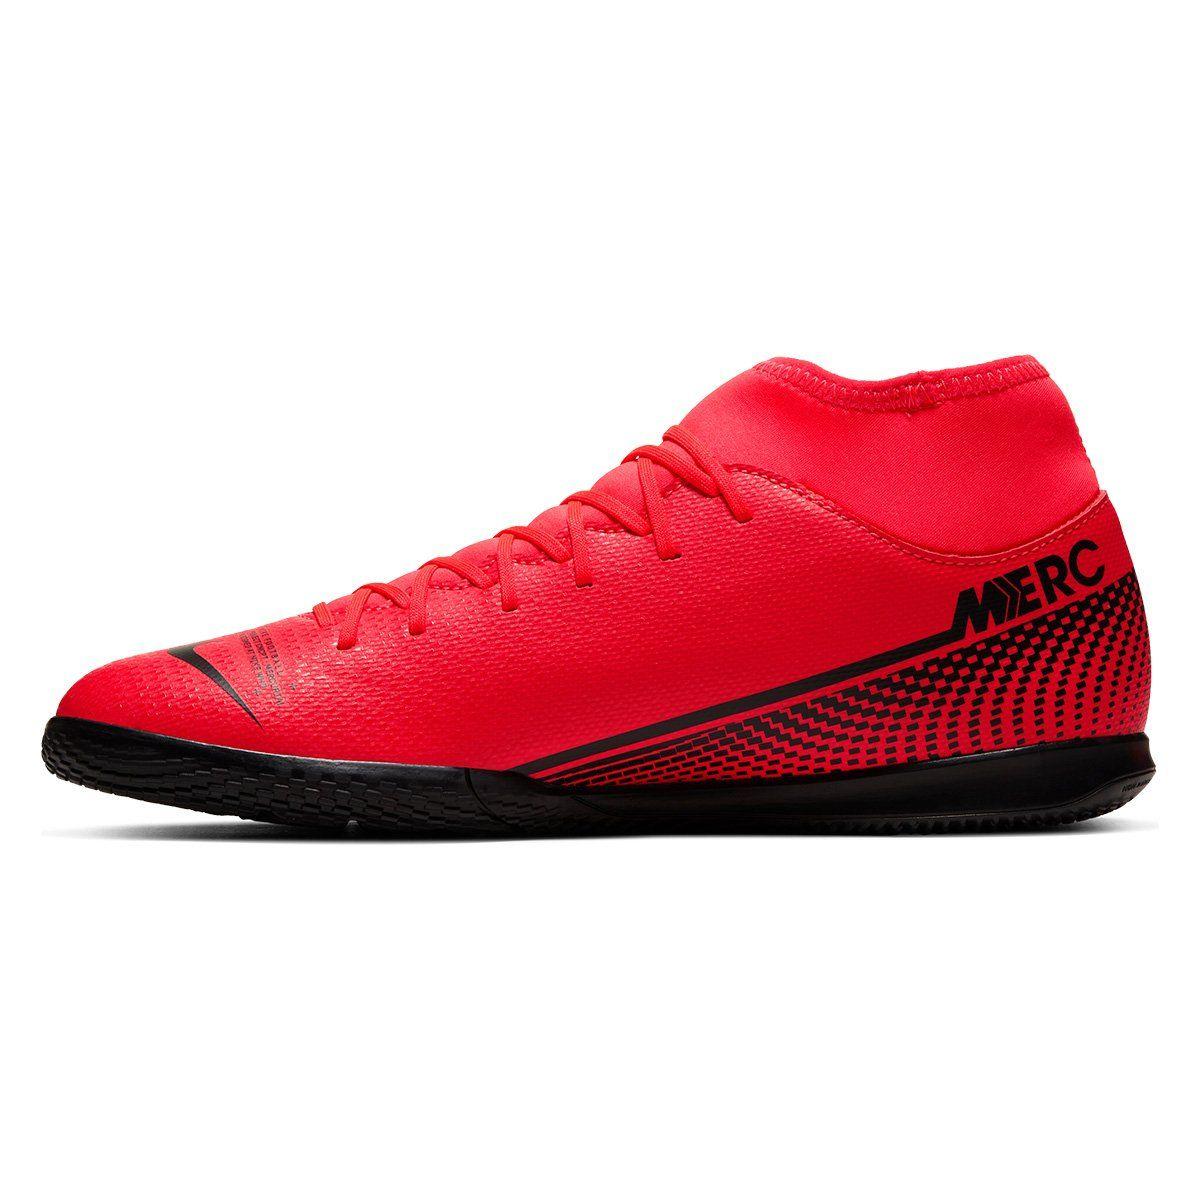 Chuteira Nike Mercurial Superfly 7 Club IC Futsal adulto